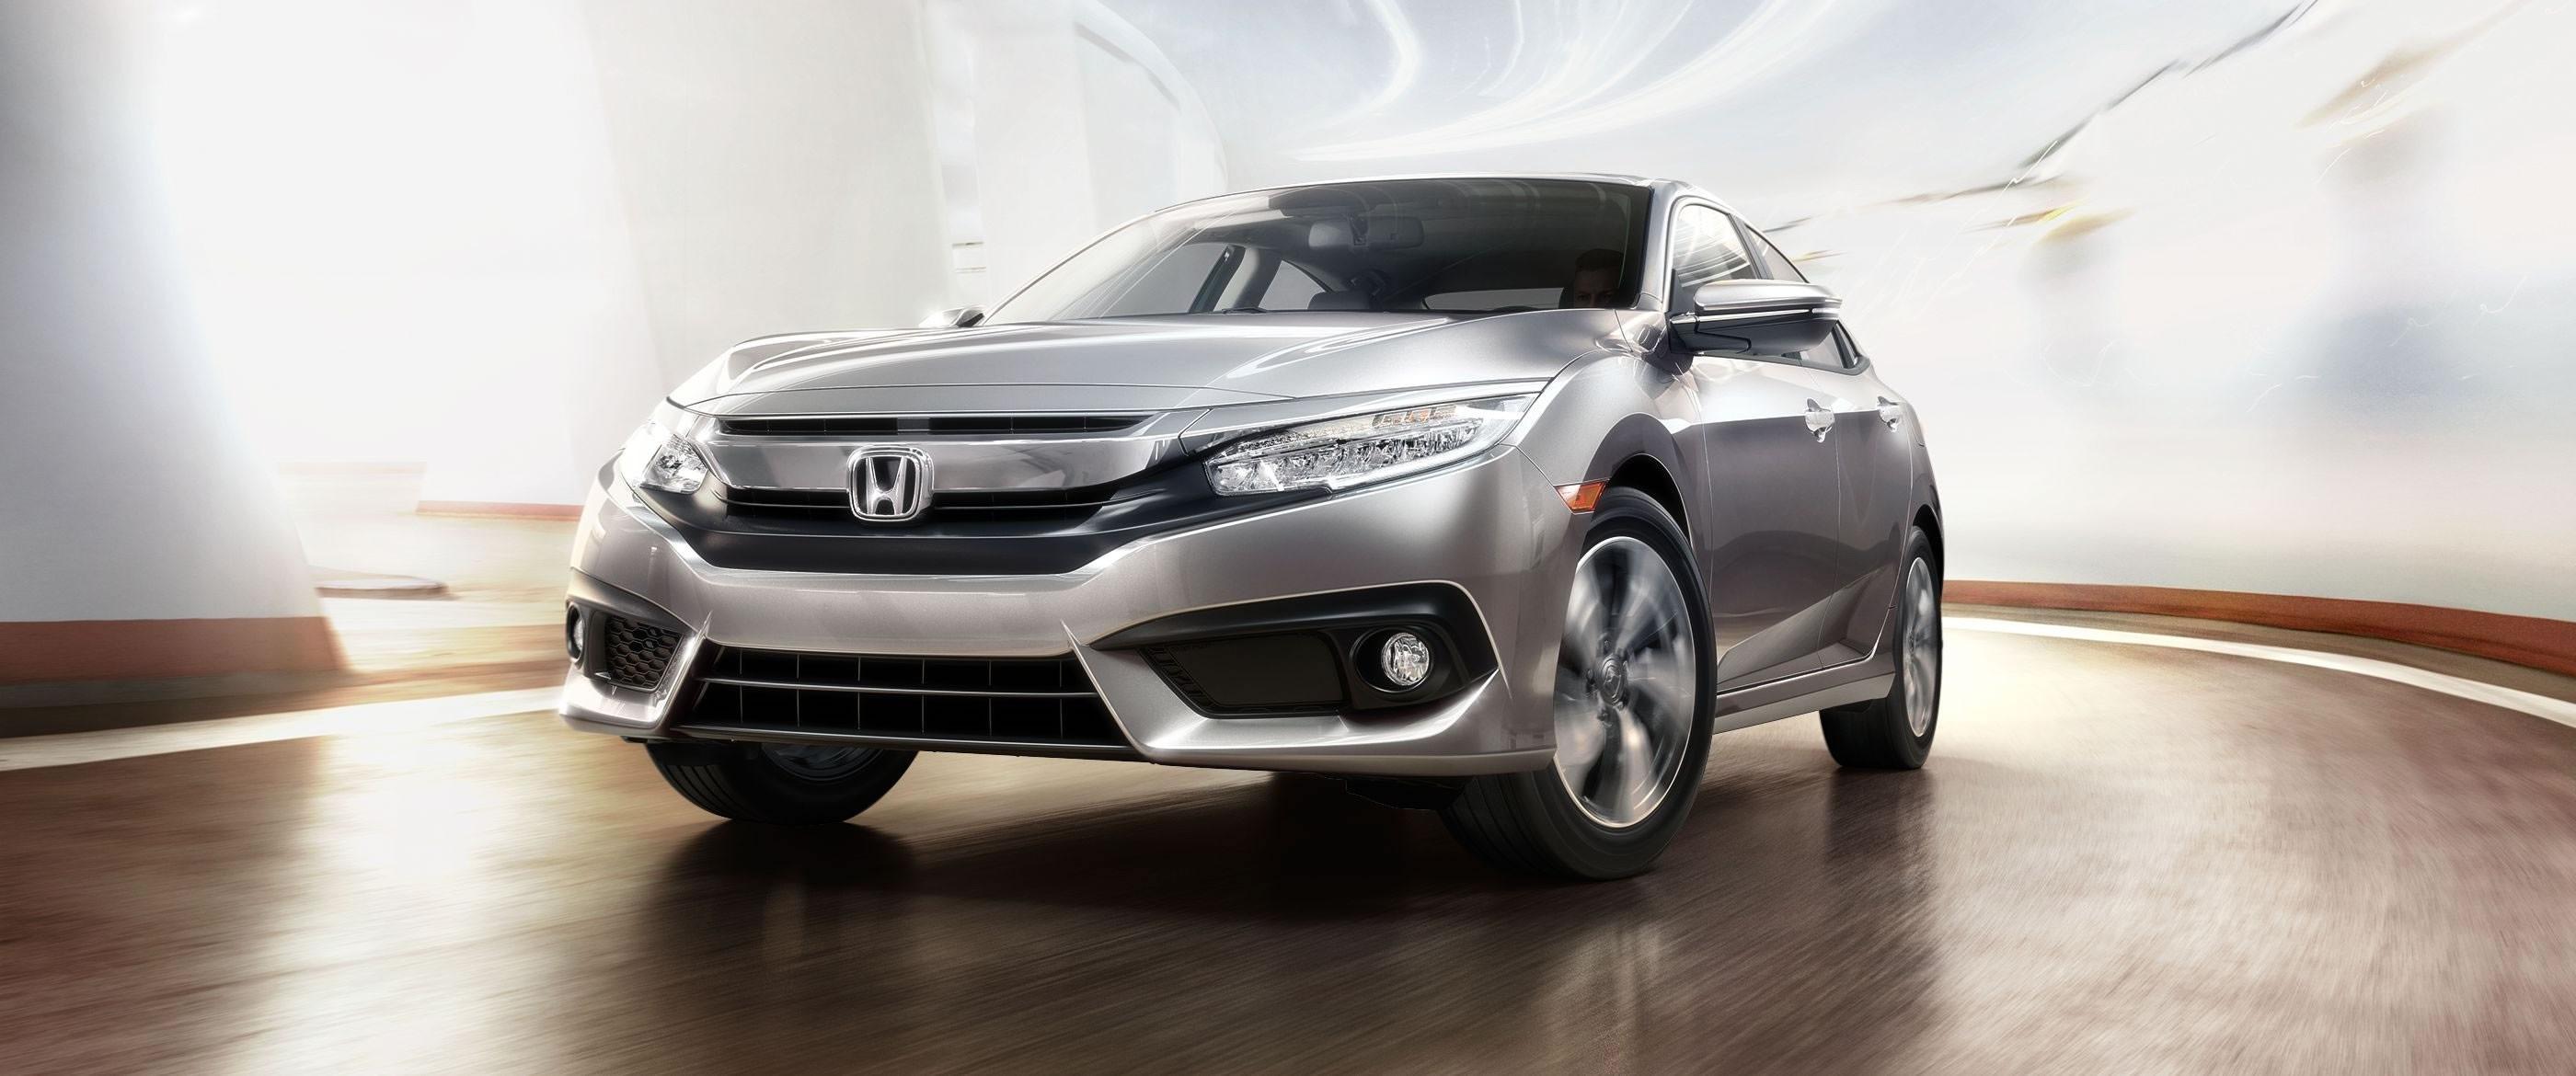 The Smartie Series Honda Guru